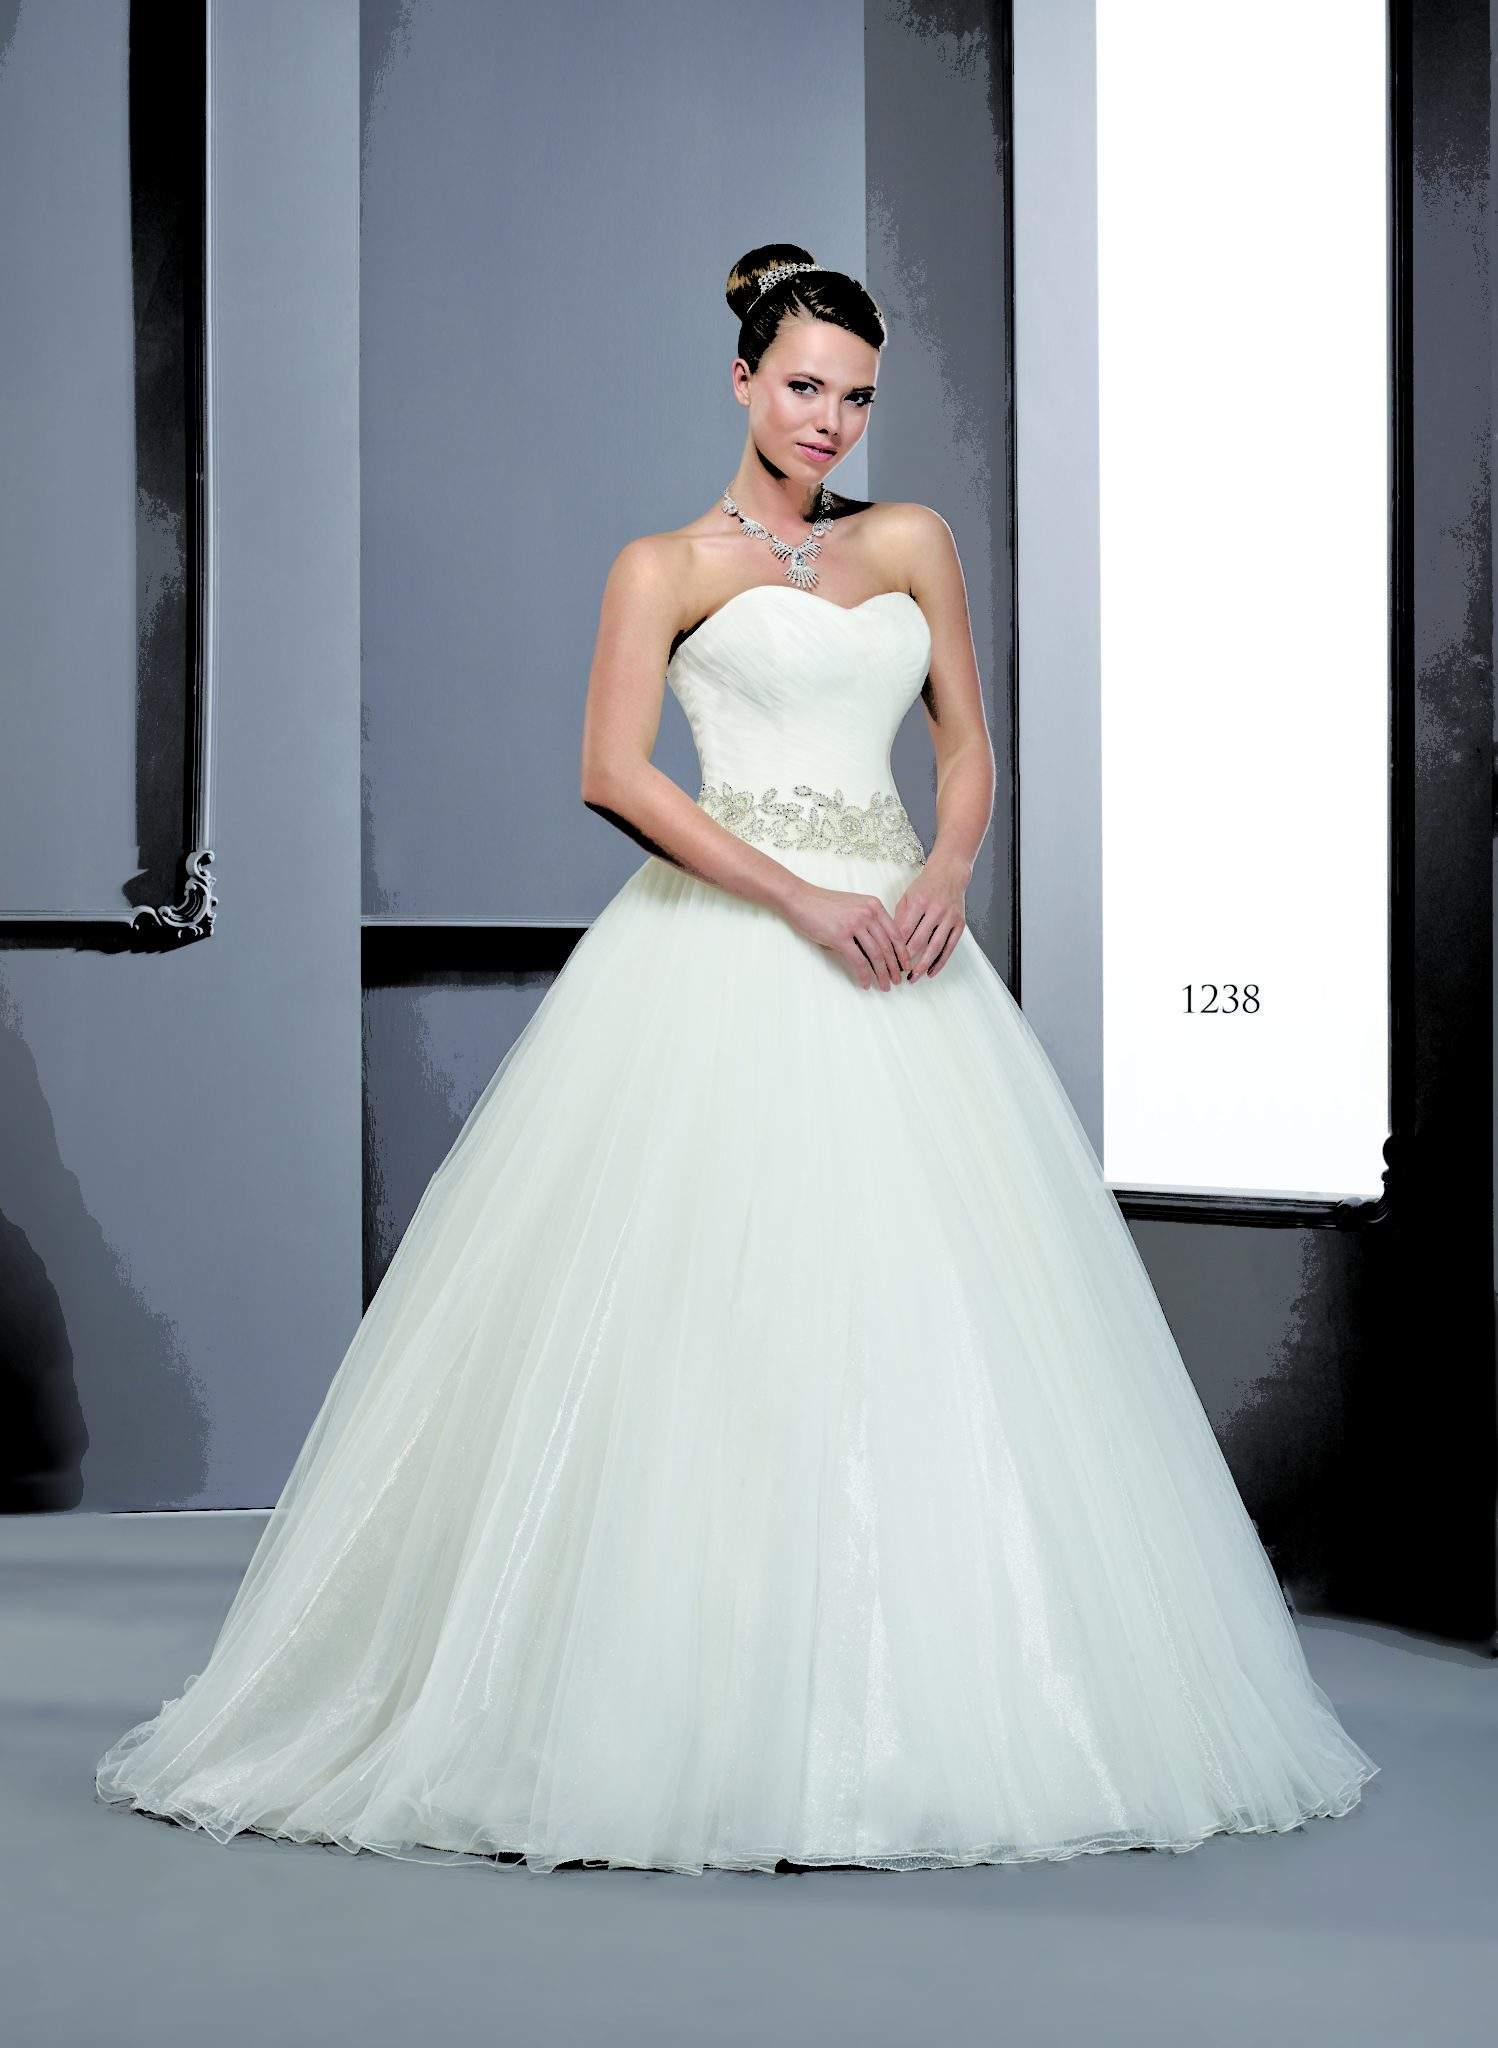 Organza Ball Gown Wedding Dresses Darius Cordell Fashion Ltd